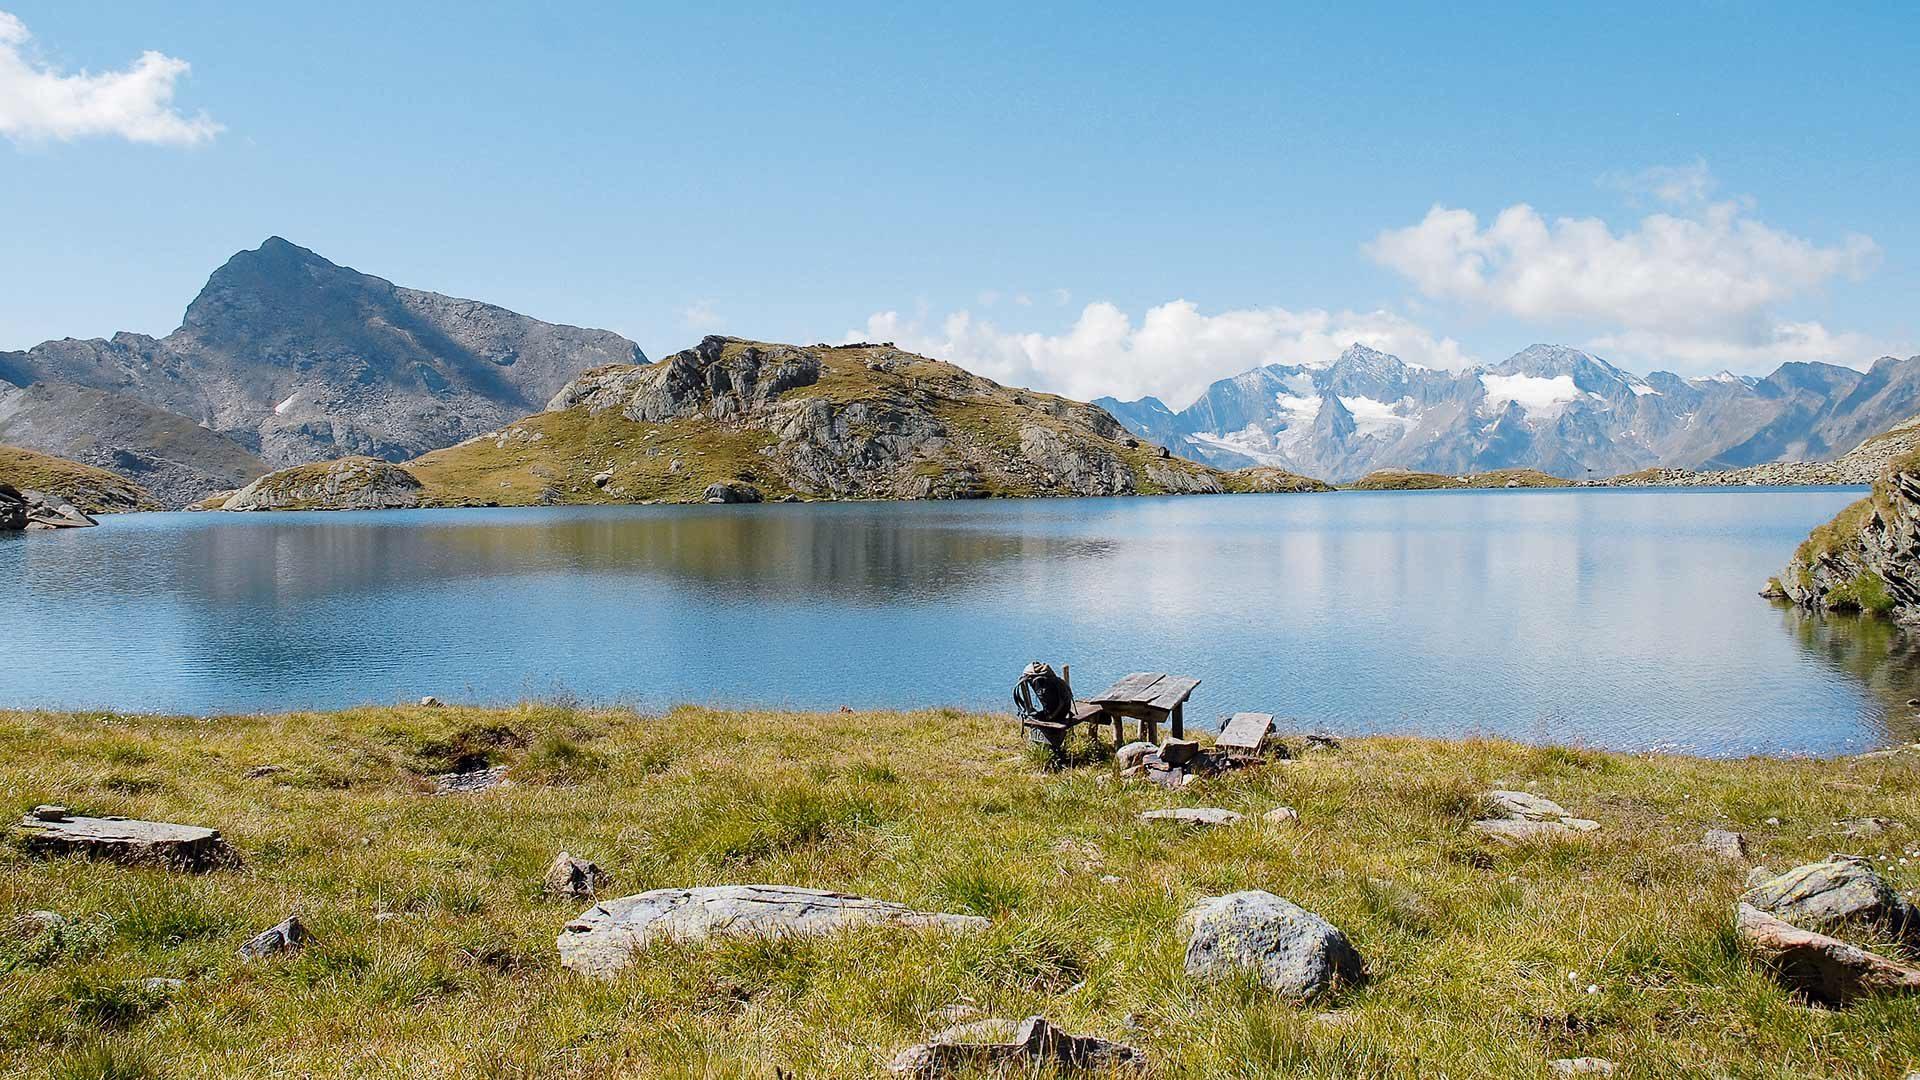 Passeggiata al lago Nero